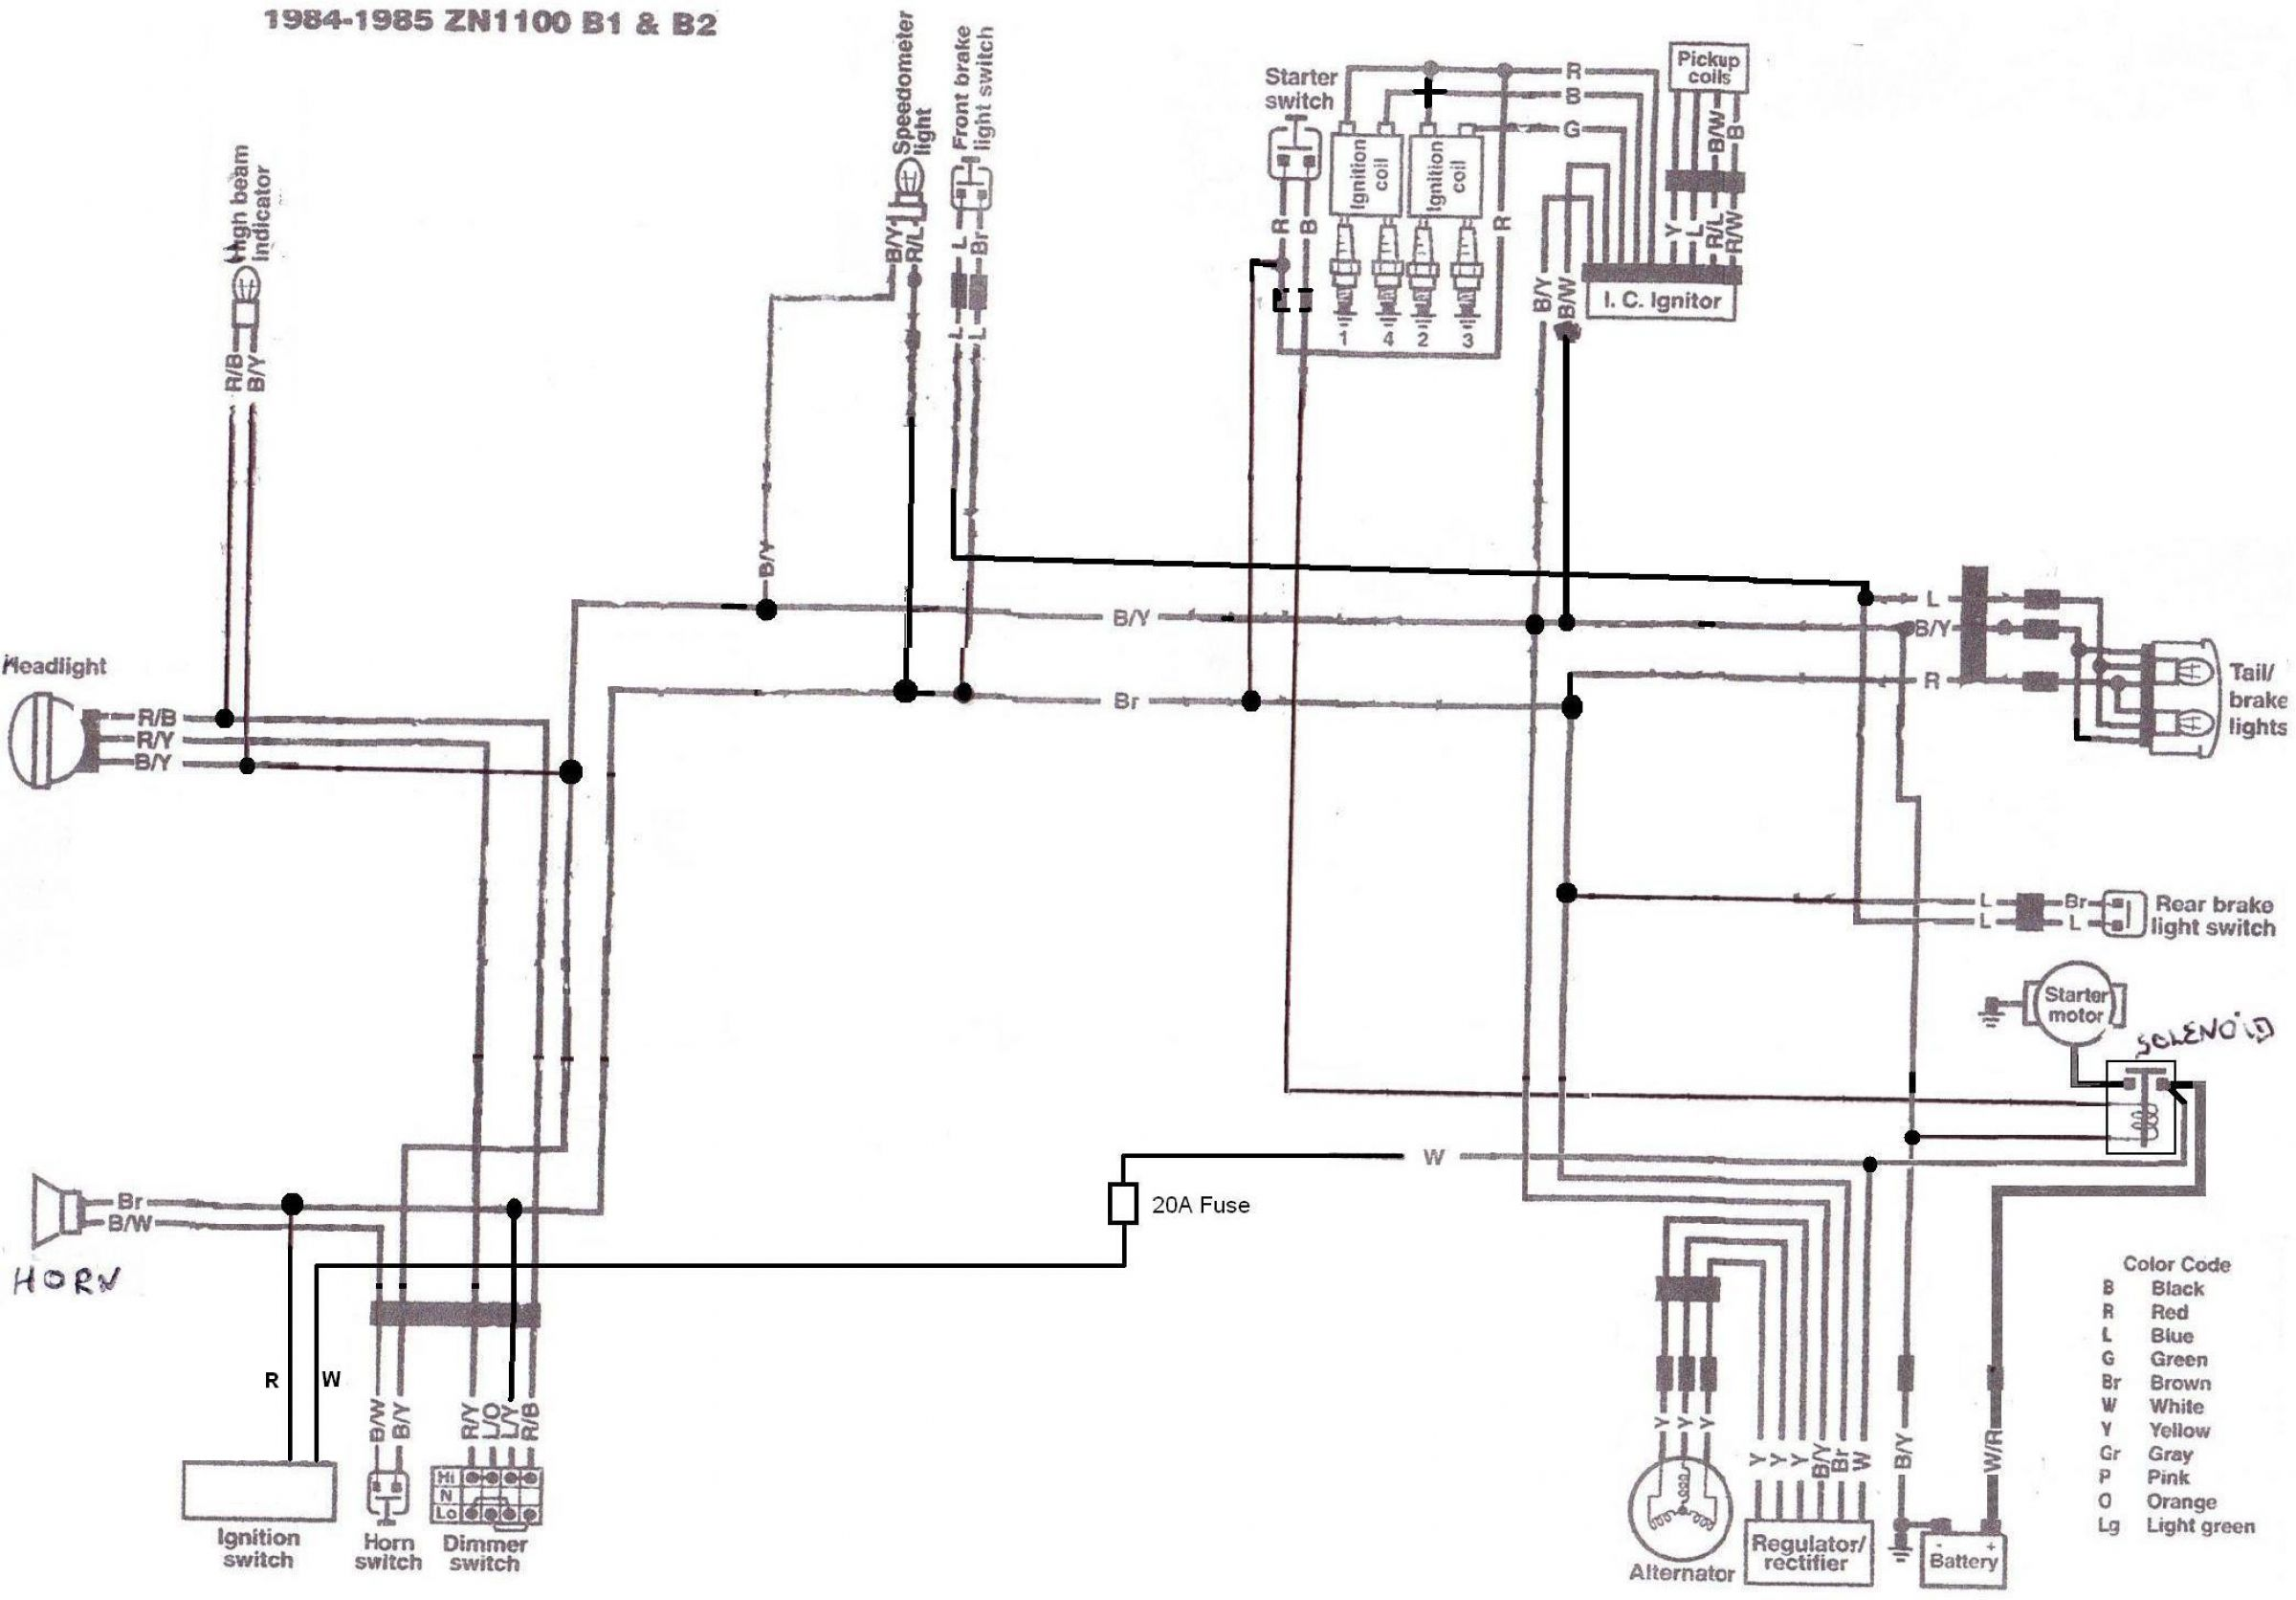 1980 750h bare bones for mattylight - kzrider forum